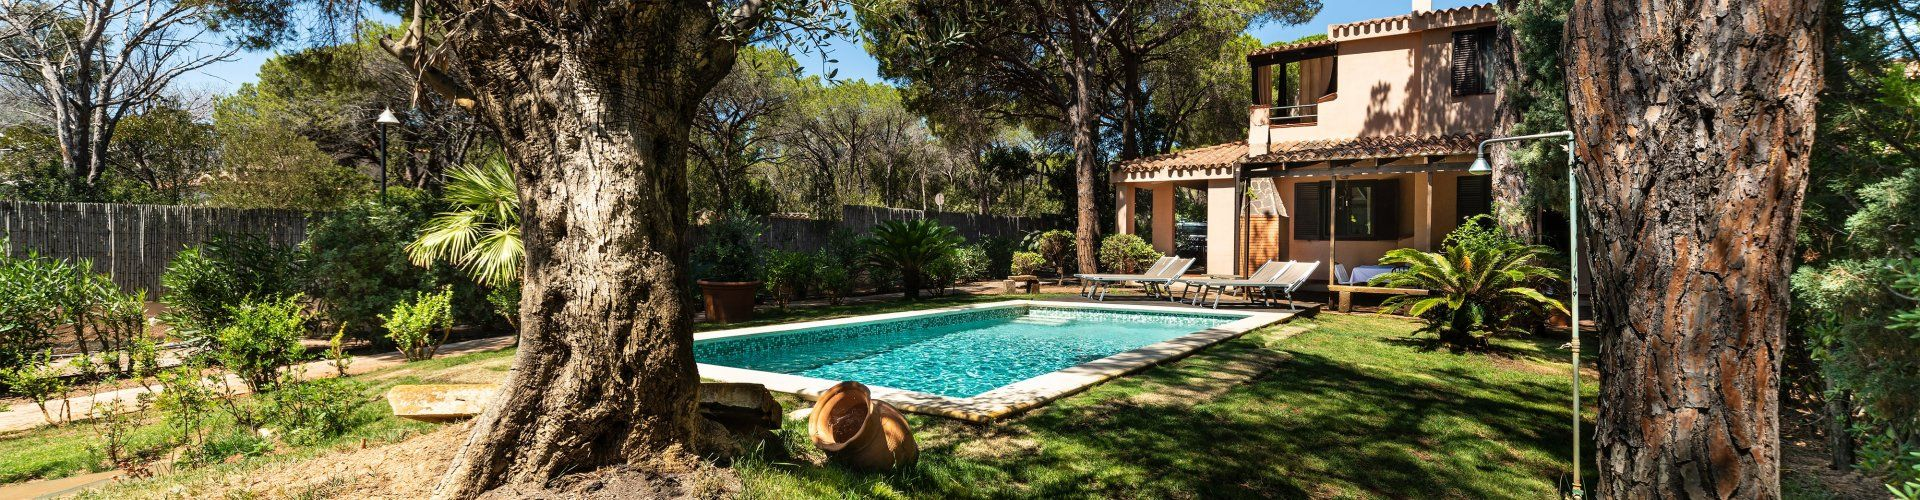 Casa con piscina privata e giardino mediterraneo